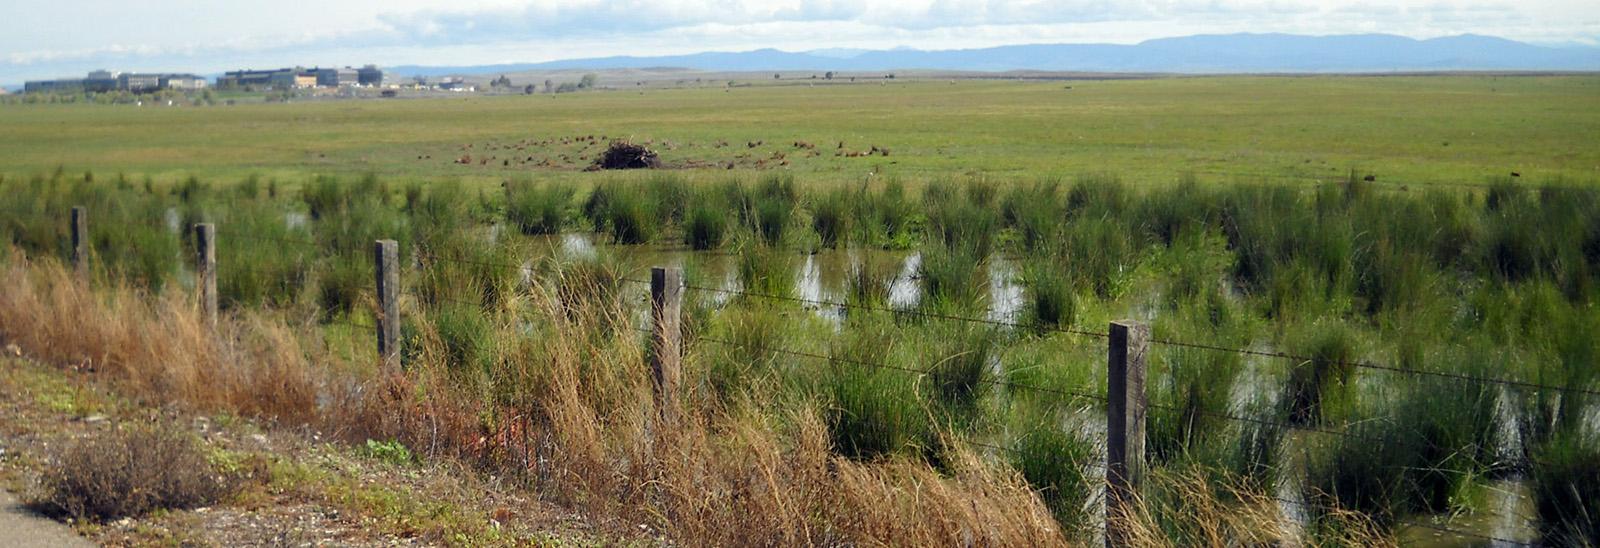 CEQA, Environmental Planning, Environmental Protection